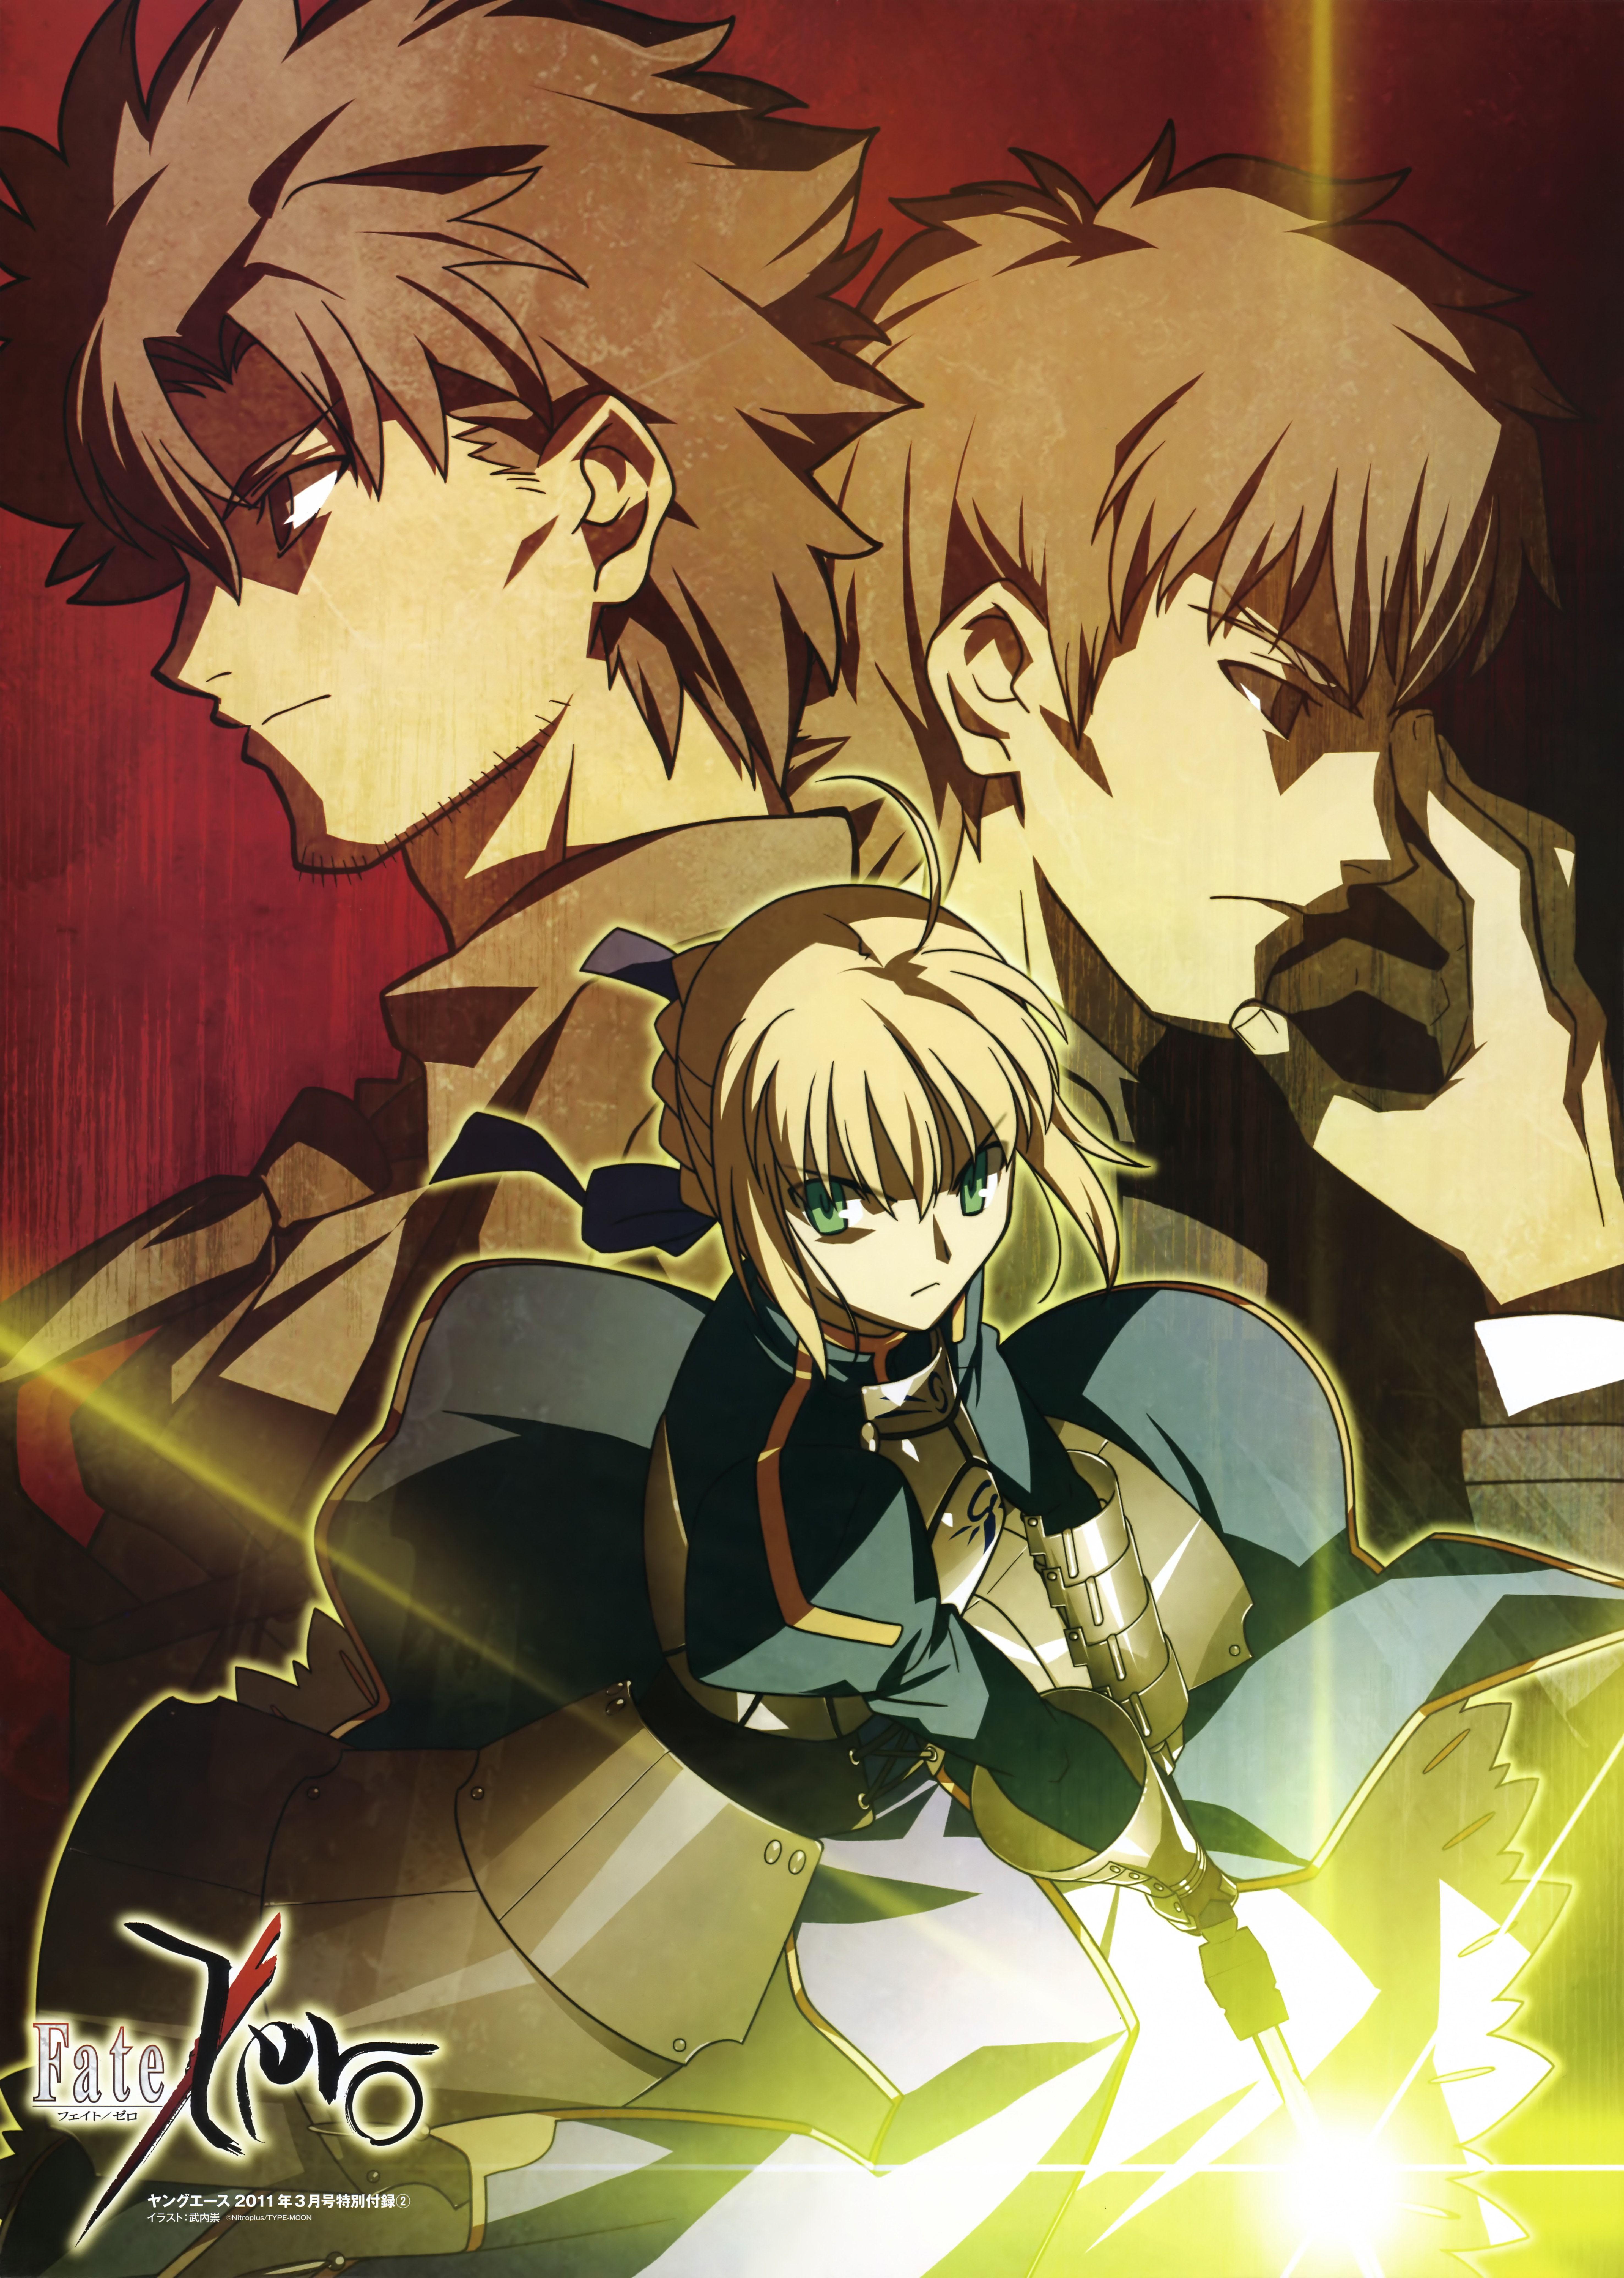 Fate/Zero Saber, Emiya Kiritsugu and Kotomine Kirei